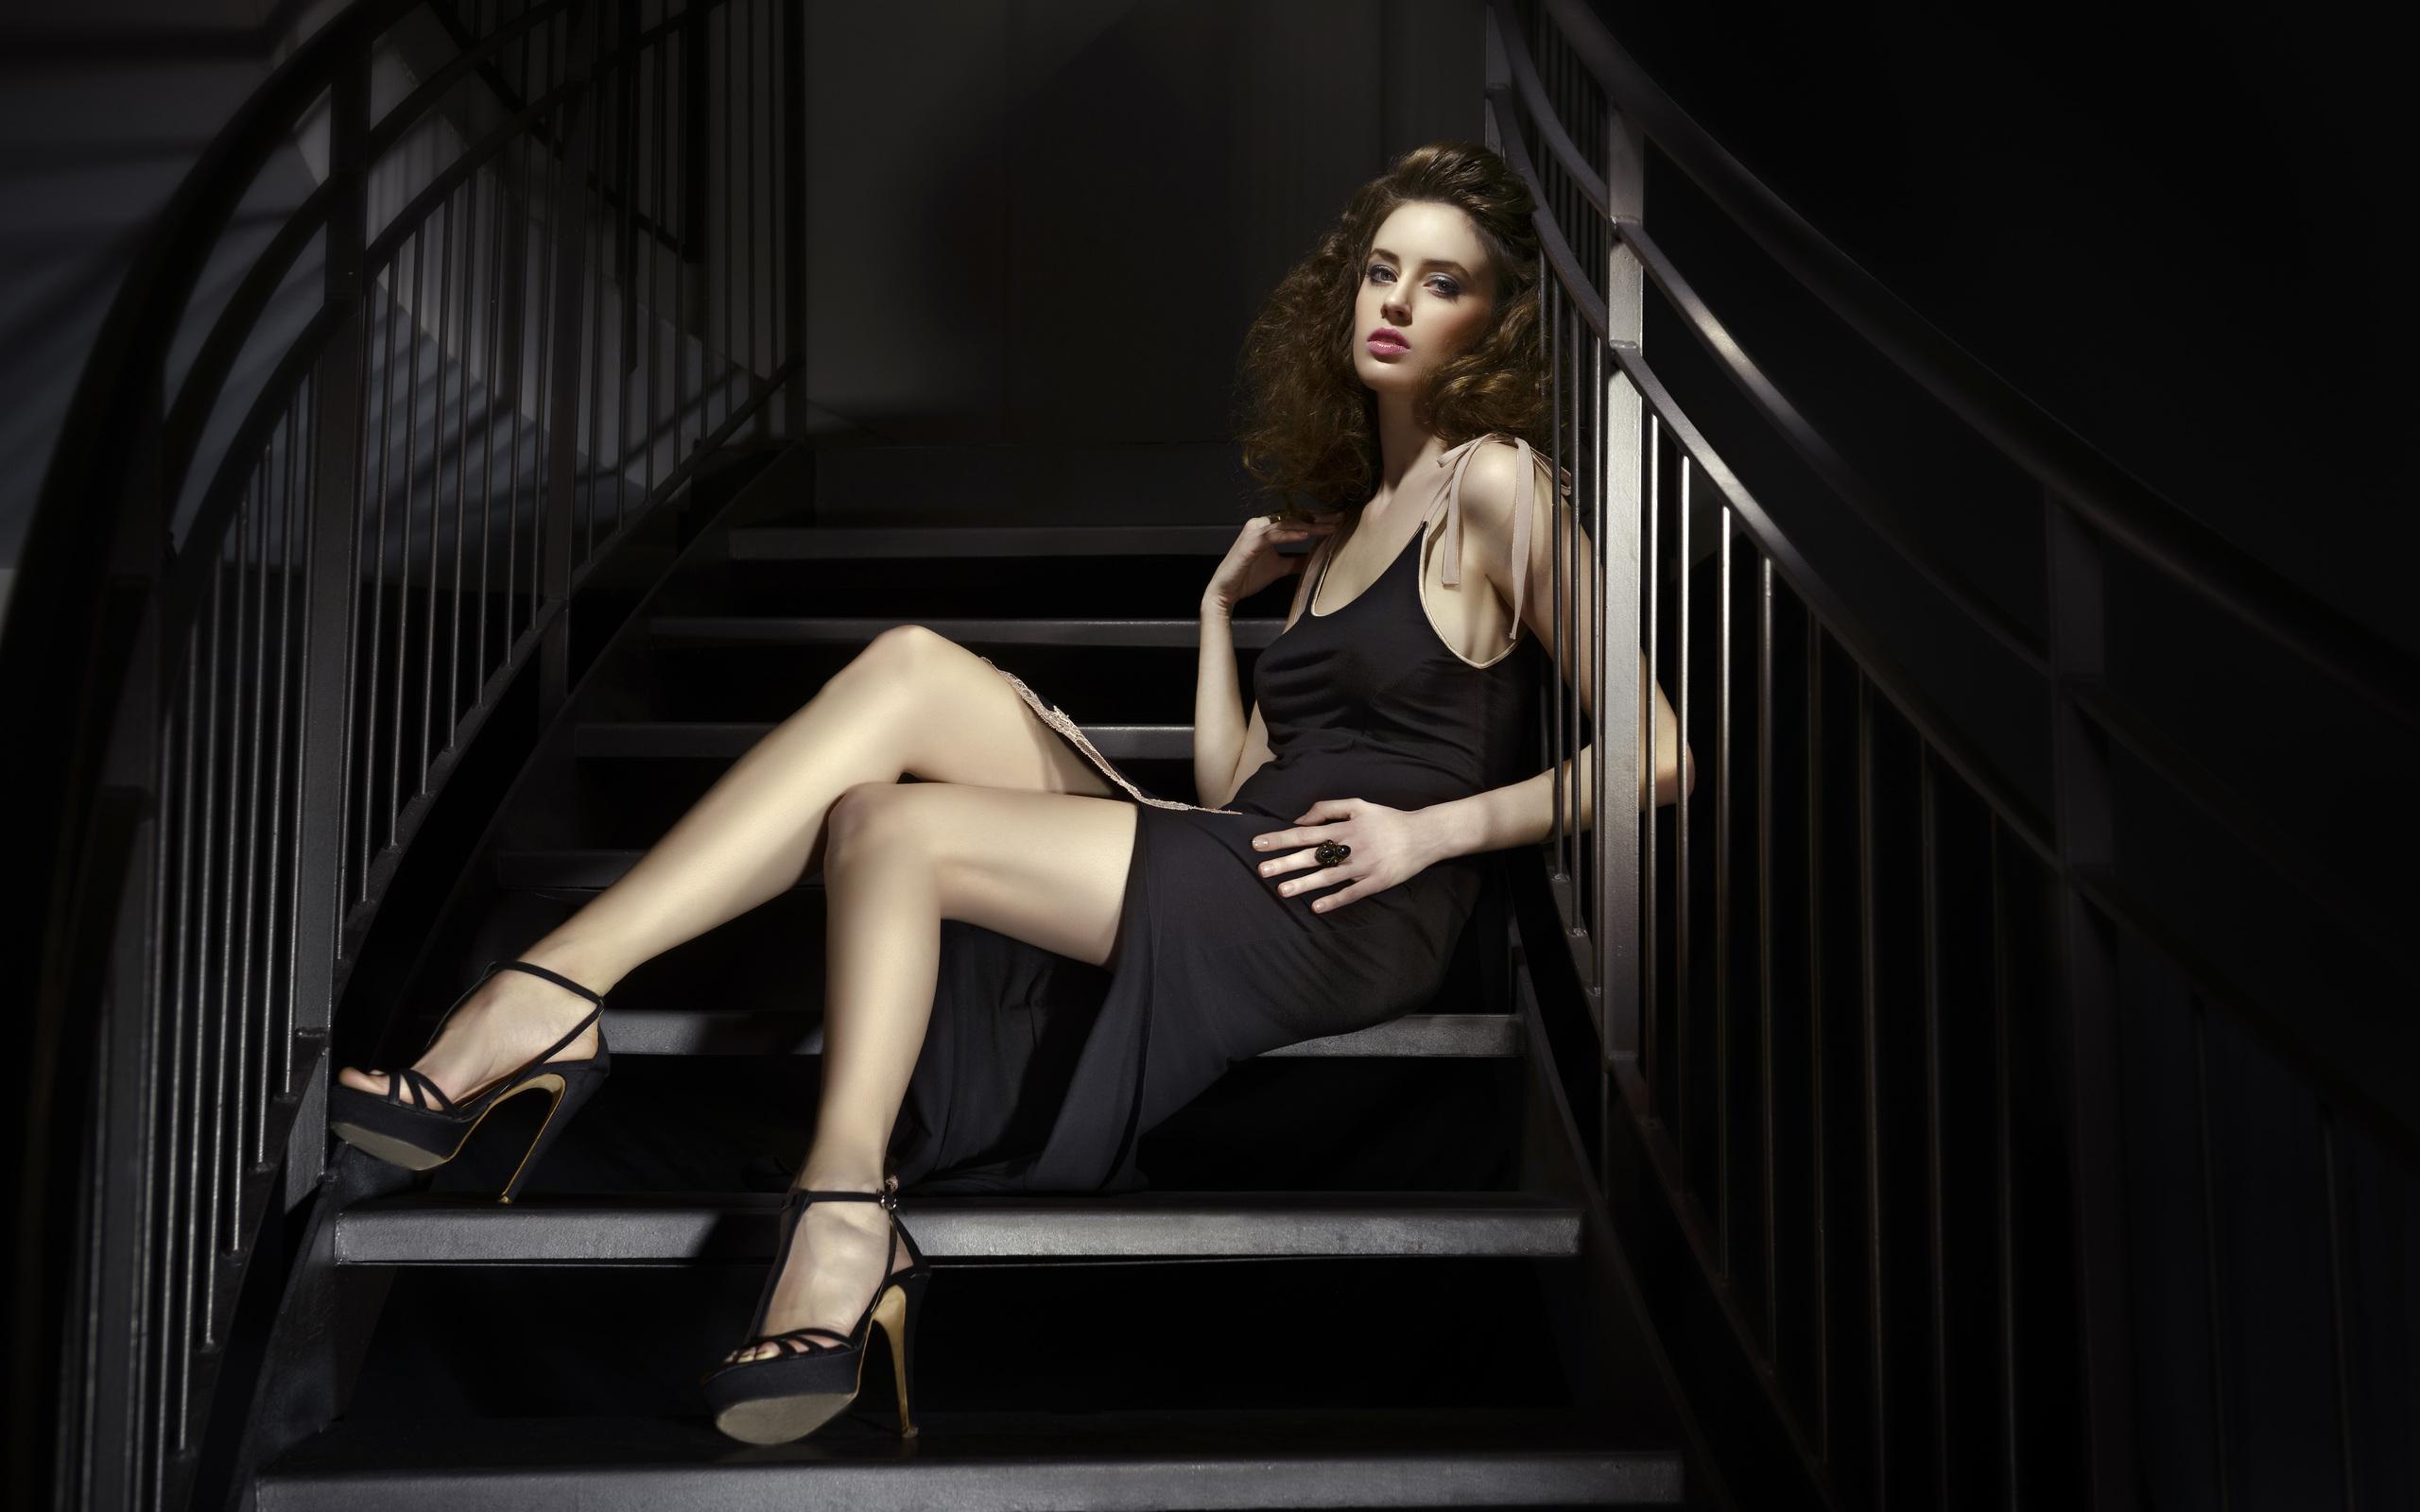 girl-sitting-stairs-black-dress-8k-if.jpg